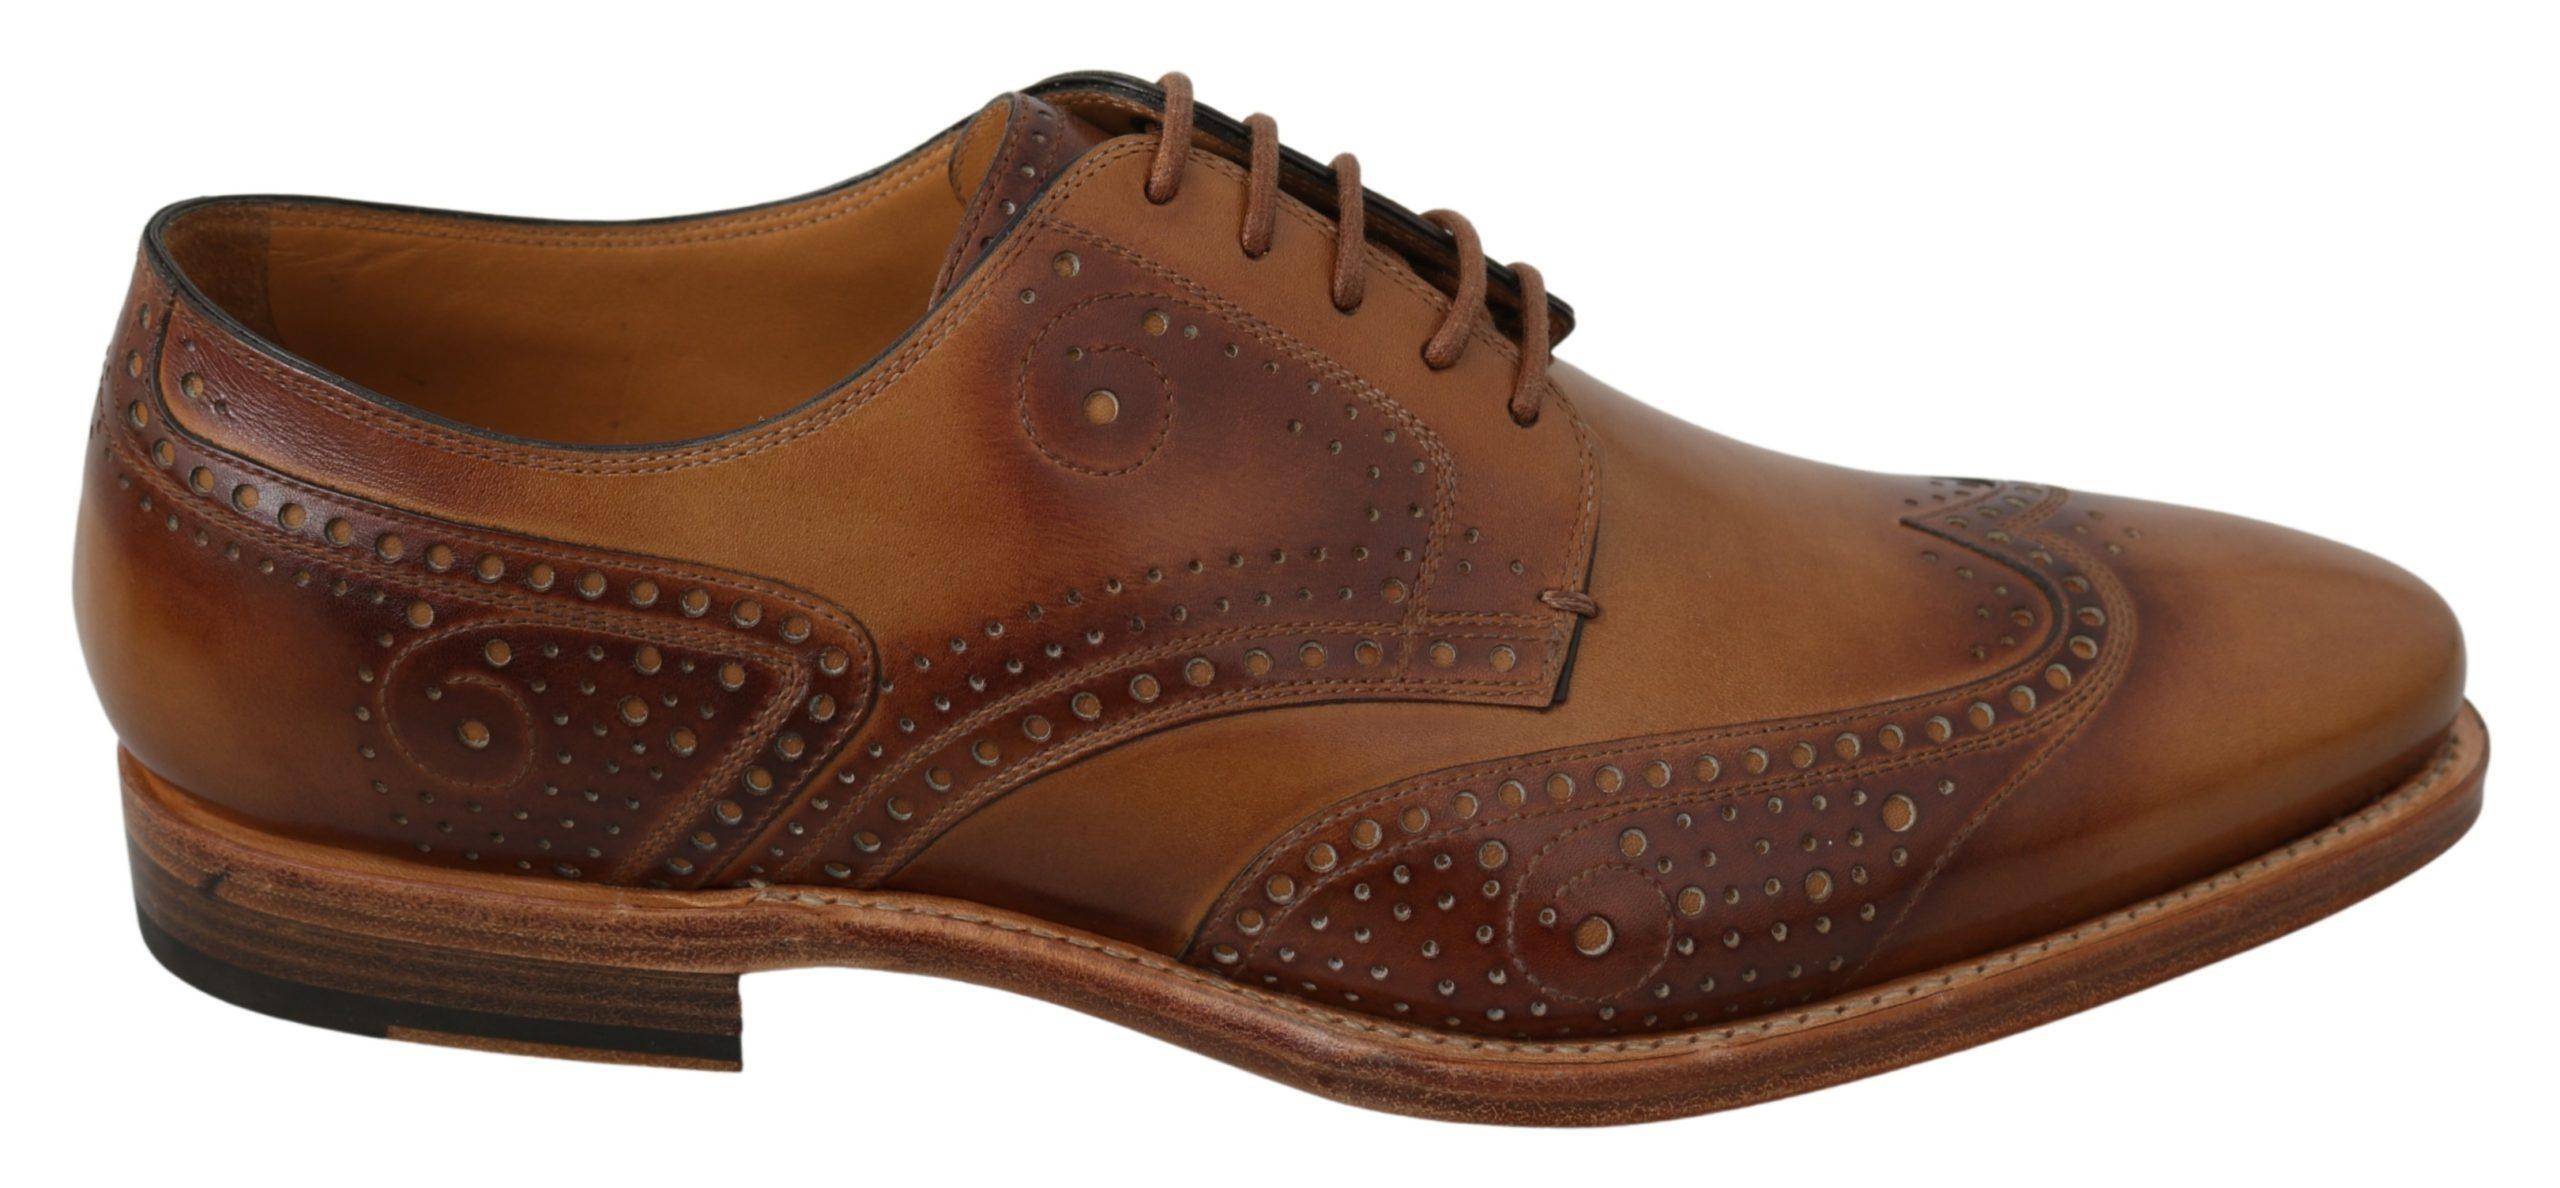 Dolce & Gabbana Men's Leather Formal Brogue Shoe Brown MV2881 - EU42/US9